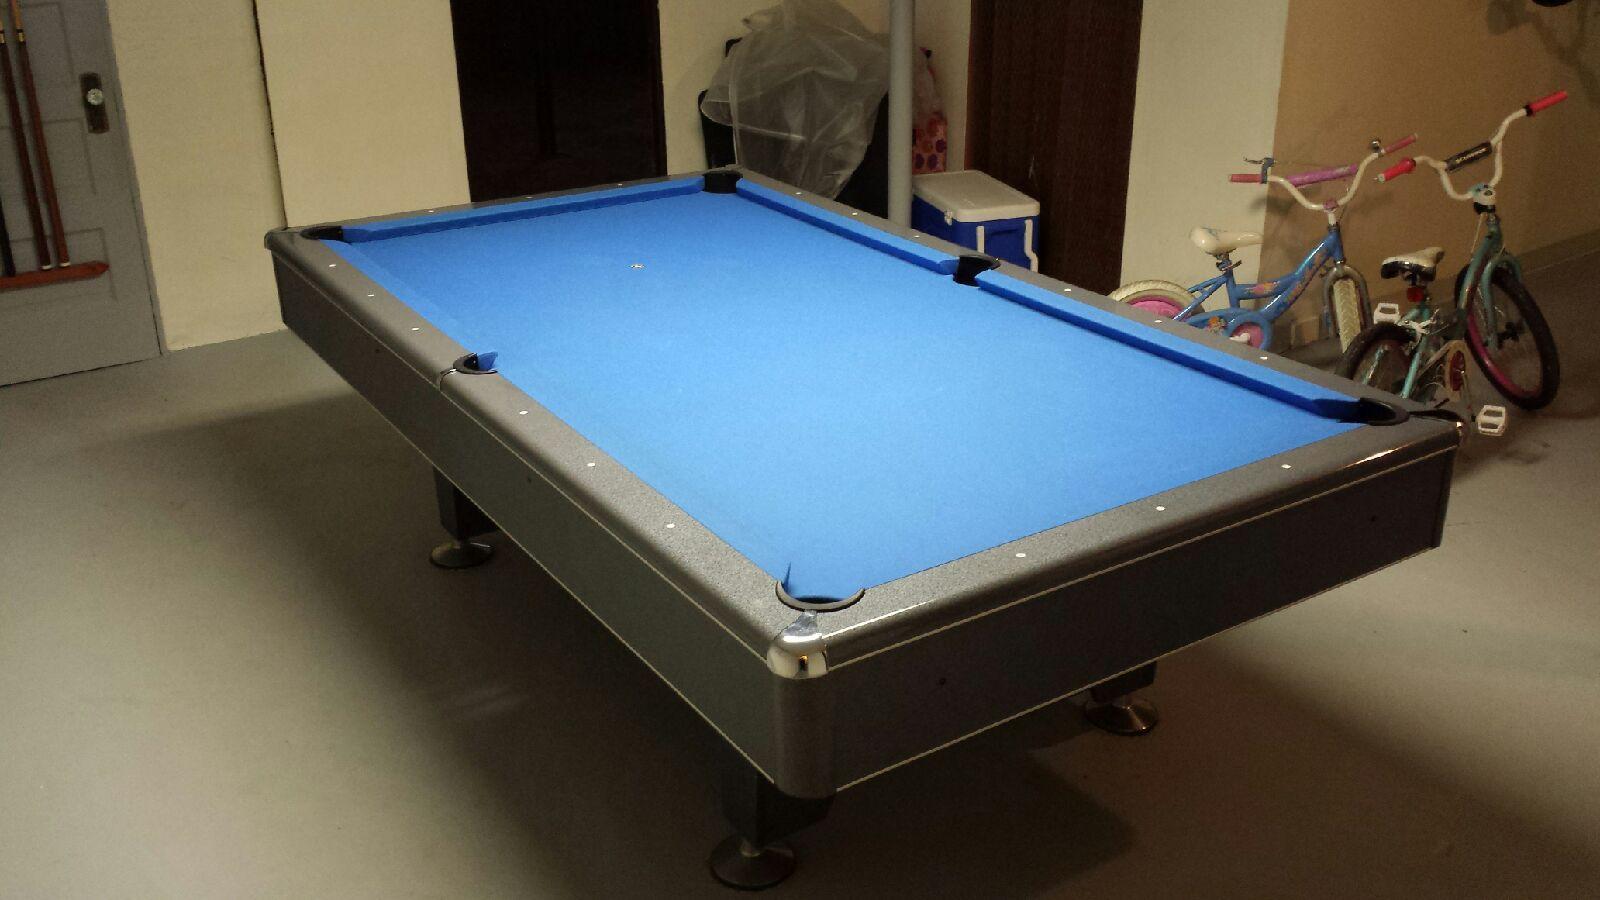 Imperial Billiards Gray Eliminator Genuine Slate Pool Table SOLD In - Eliminator pool table